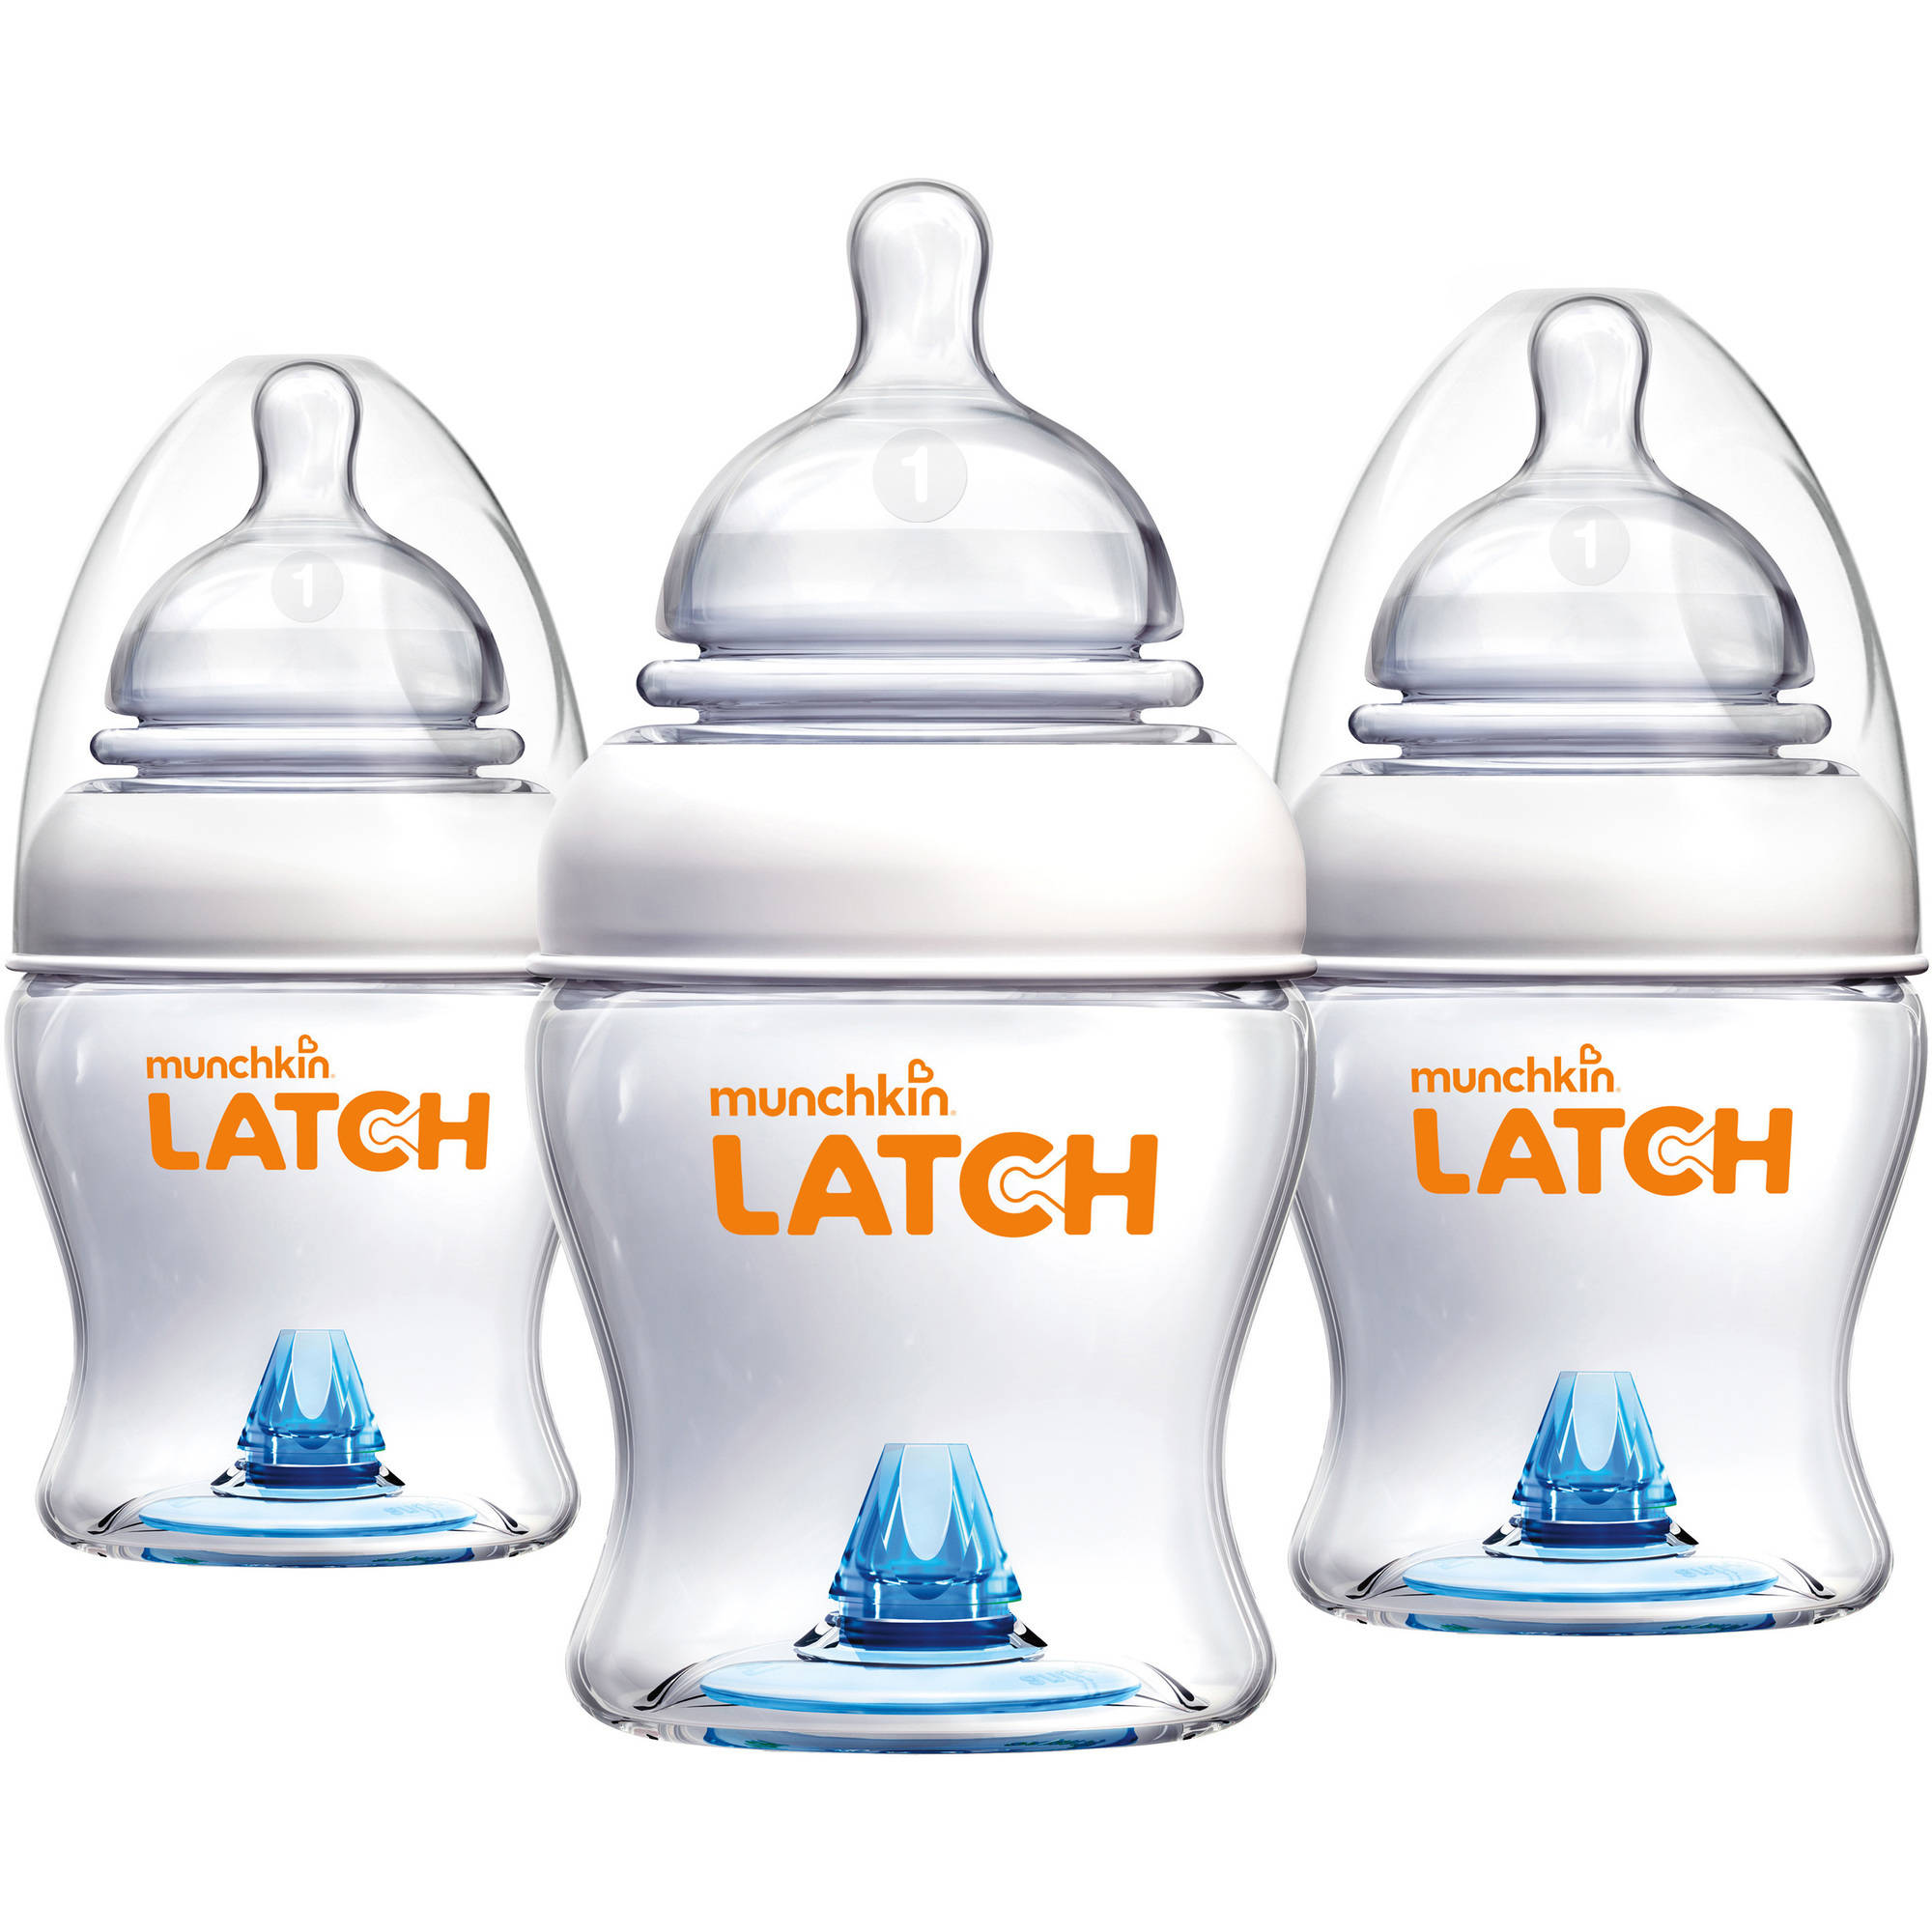 Munchkin LATCH 4 oz Baby Bottle, 3pk